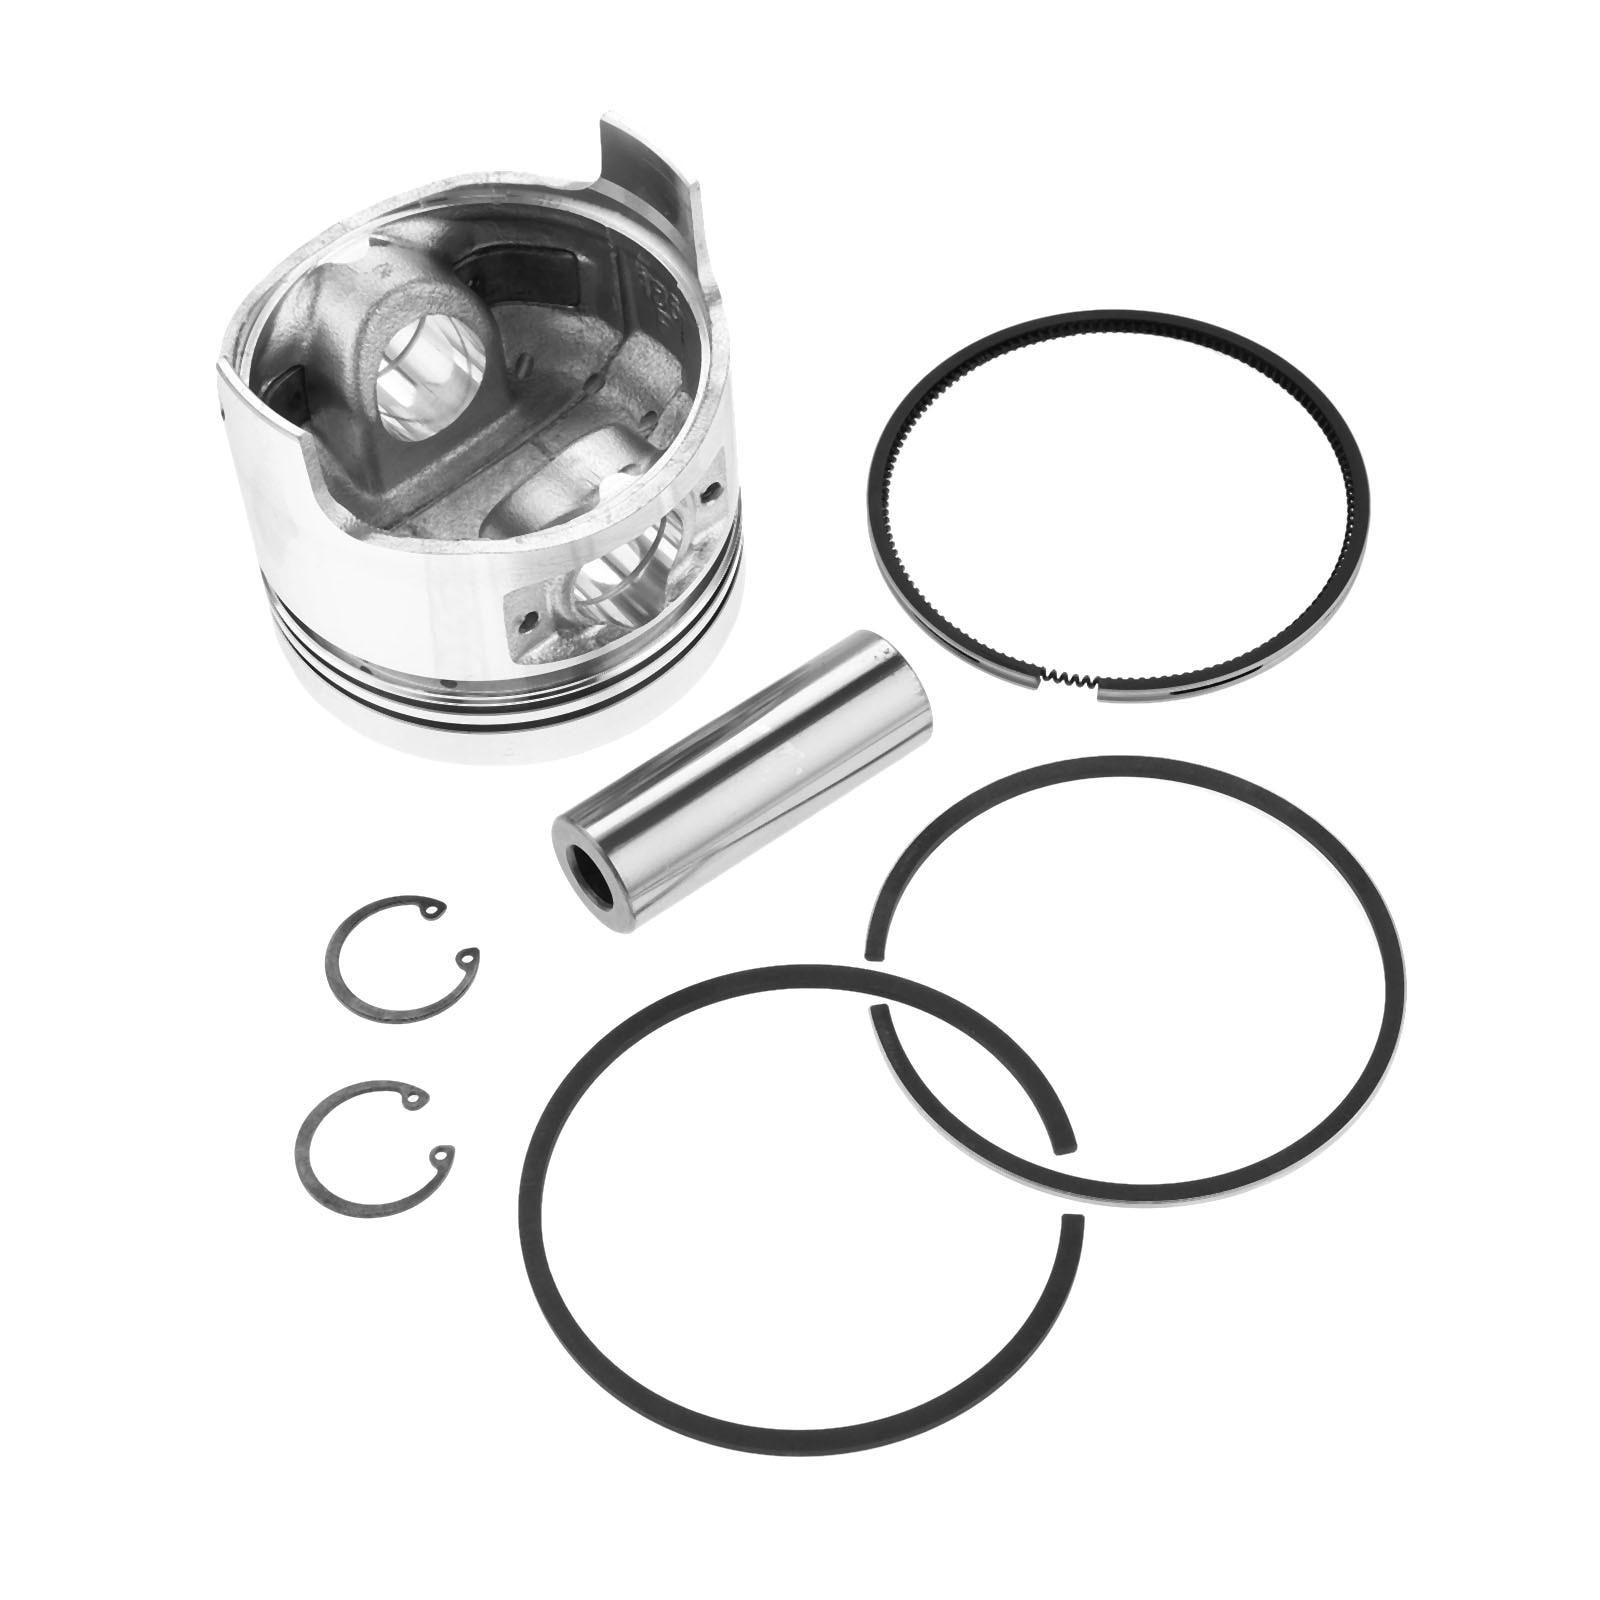 Conjunto de pistón drreld con anillo de pistón, conjunto de anillo de pistón para piezas del generador de motor Diesel chino 186F 86mm